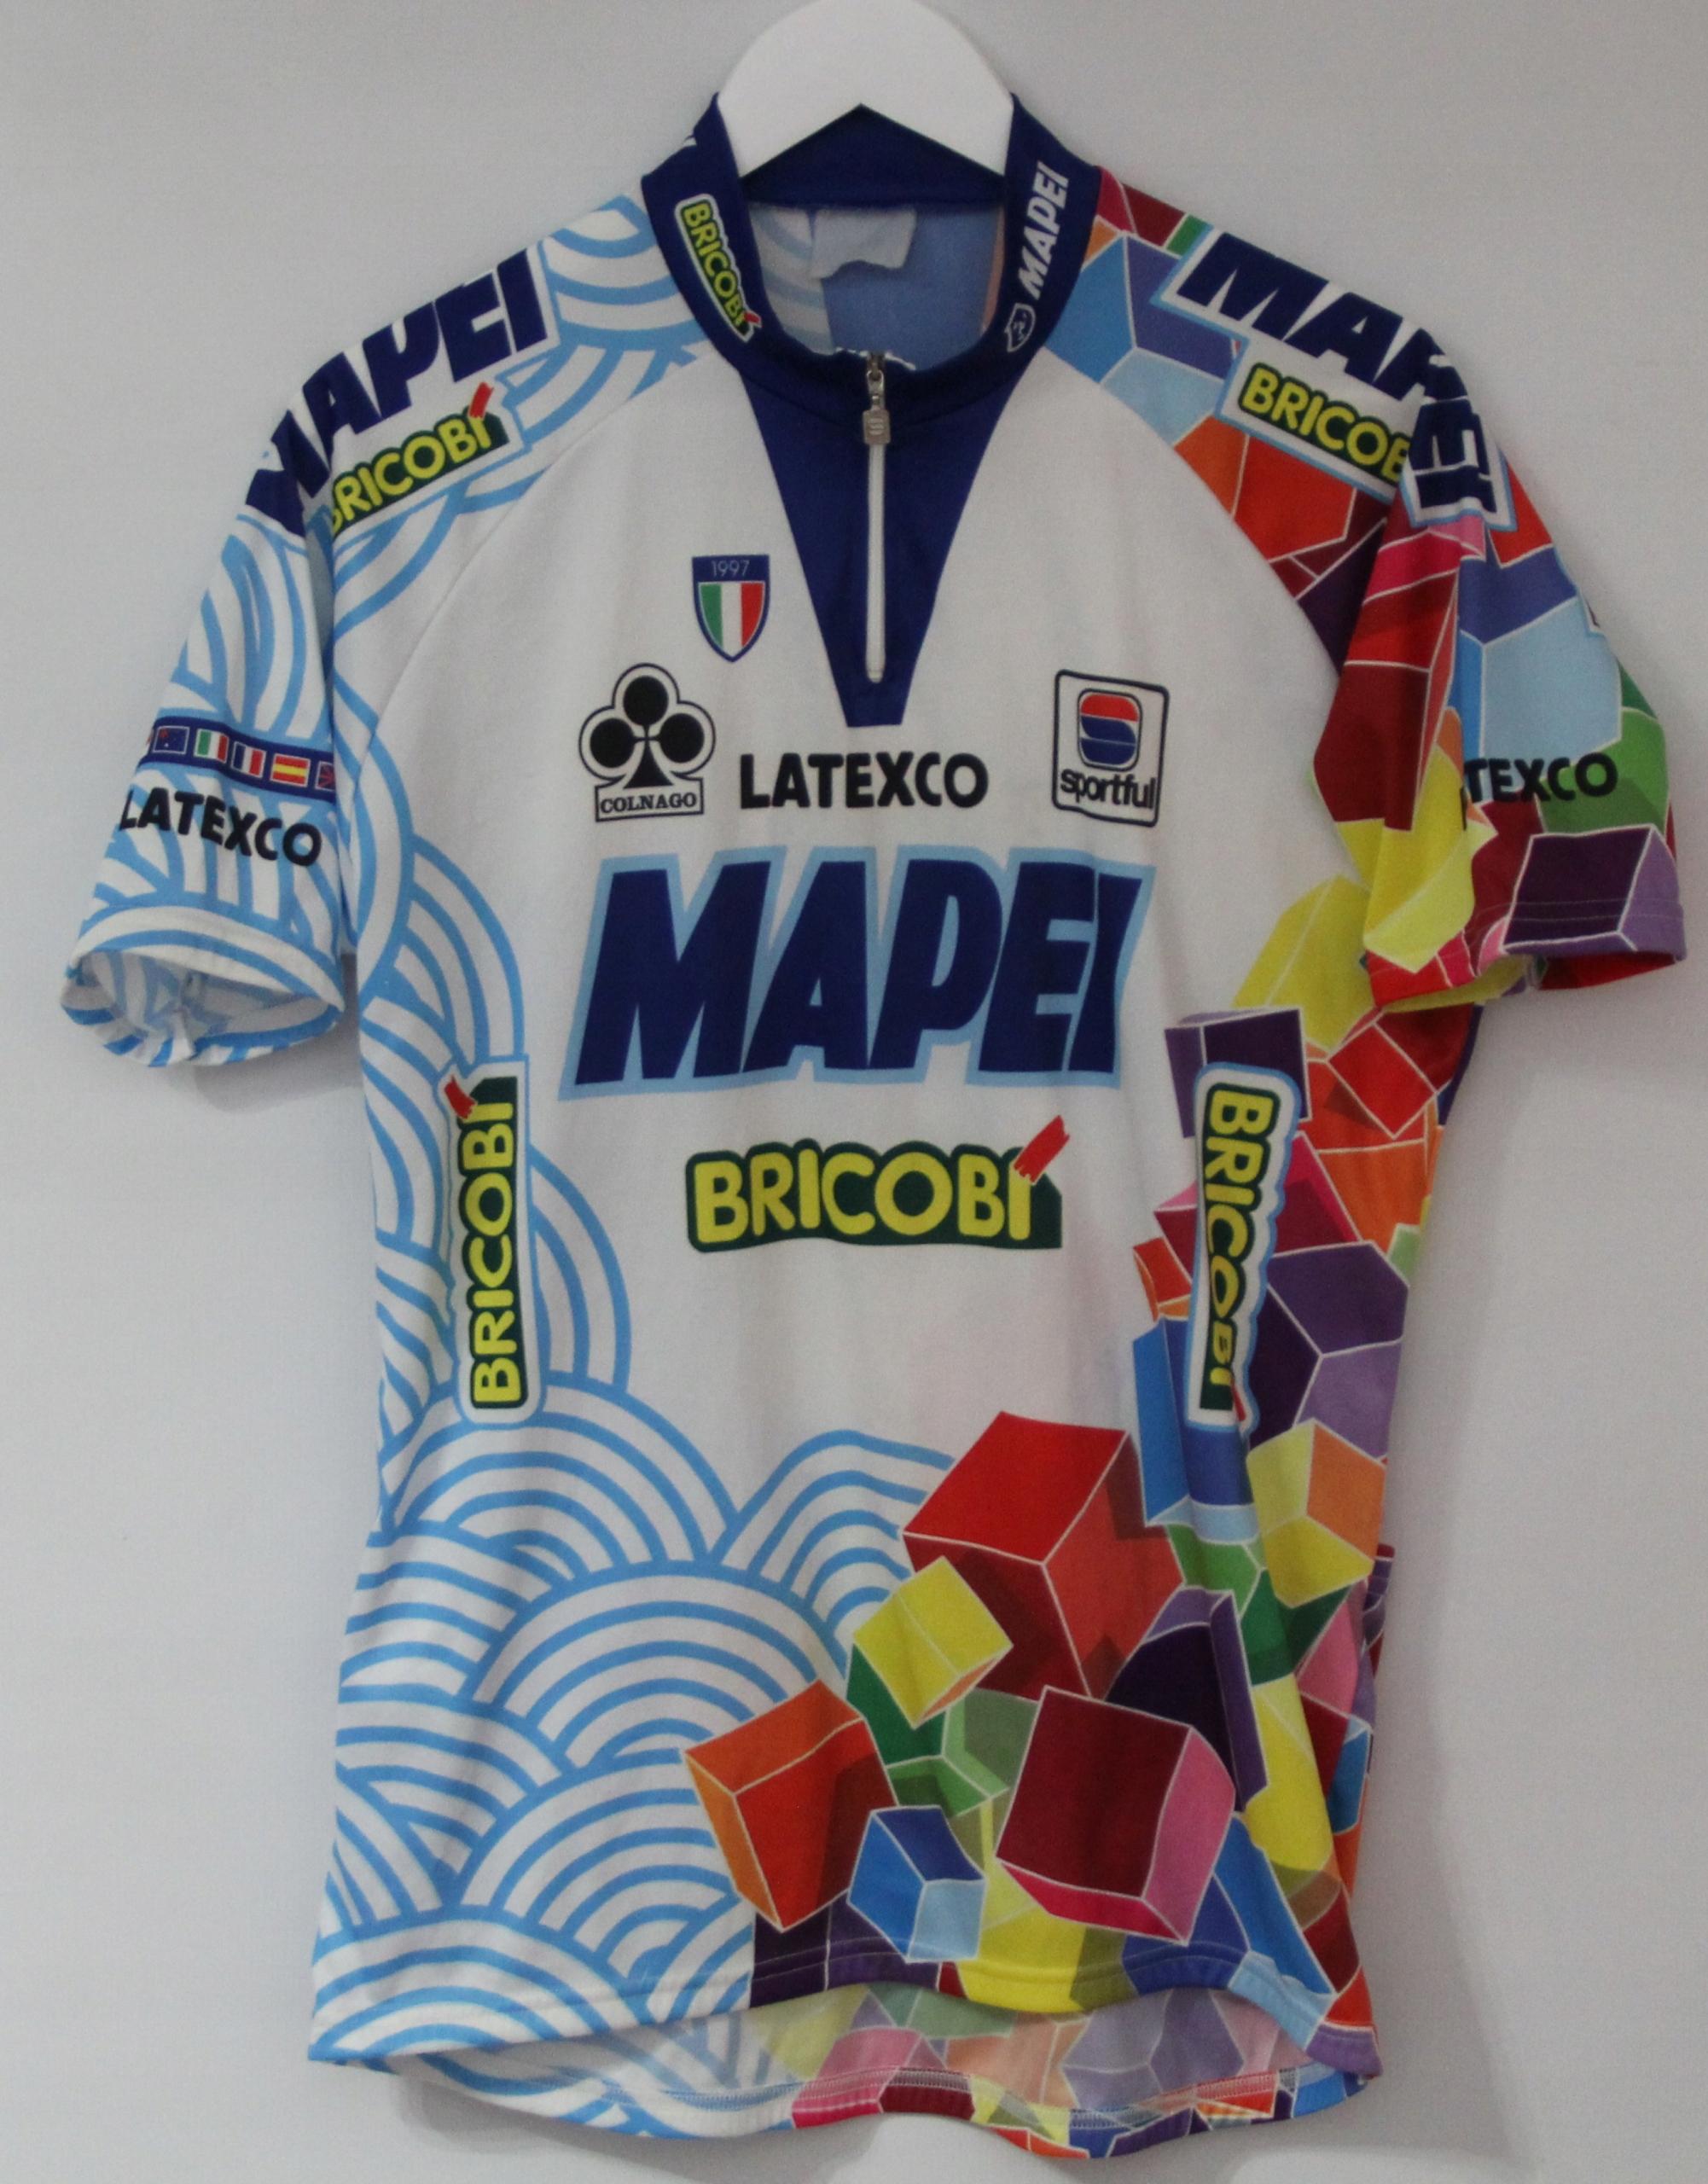 Męska Koszulka Rowerowa COLNAGO MAPEI BRICOBI '97